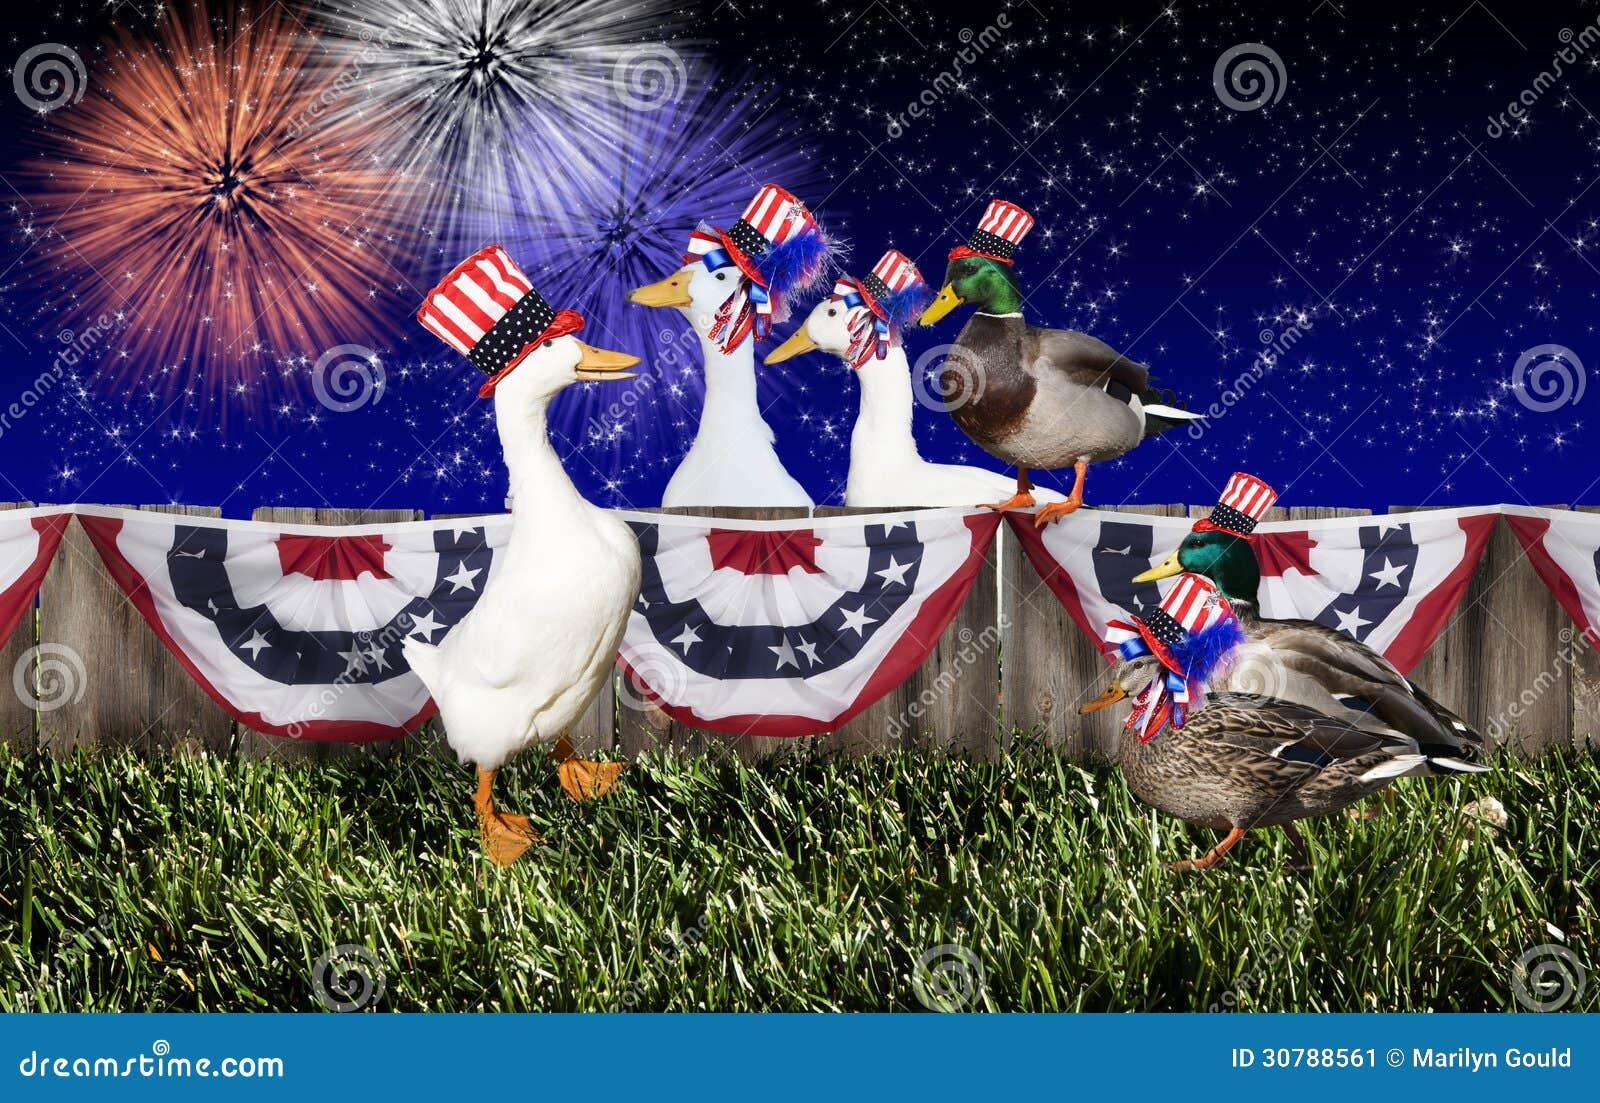 Fjärde Juli Duck Party